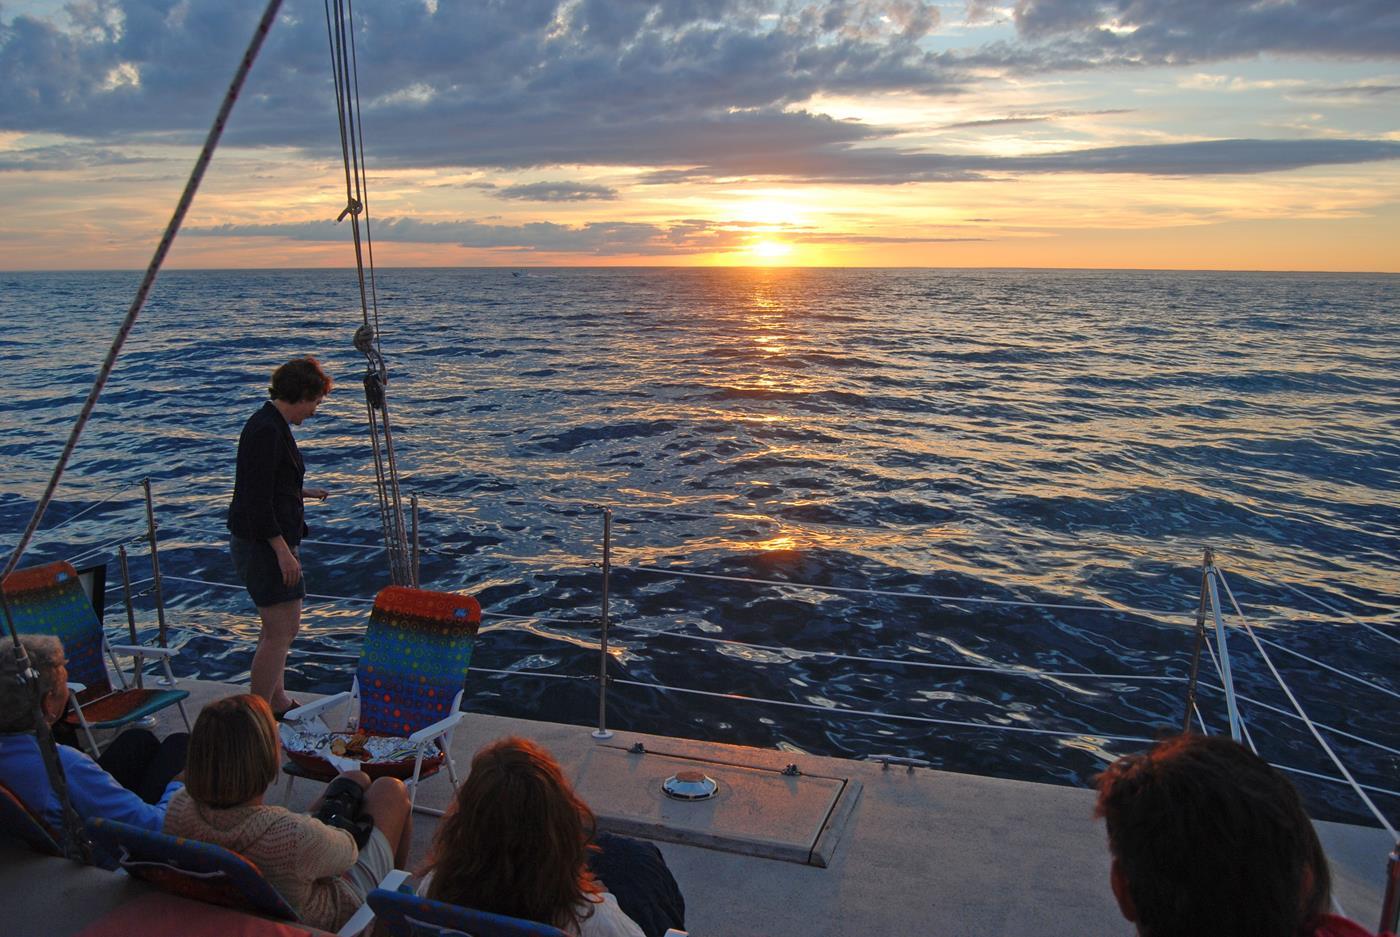 ri vacation bike tour sunset sail great freedom adventures